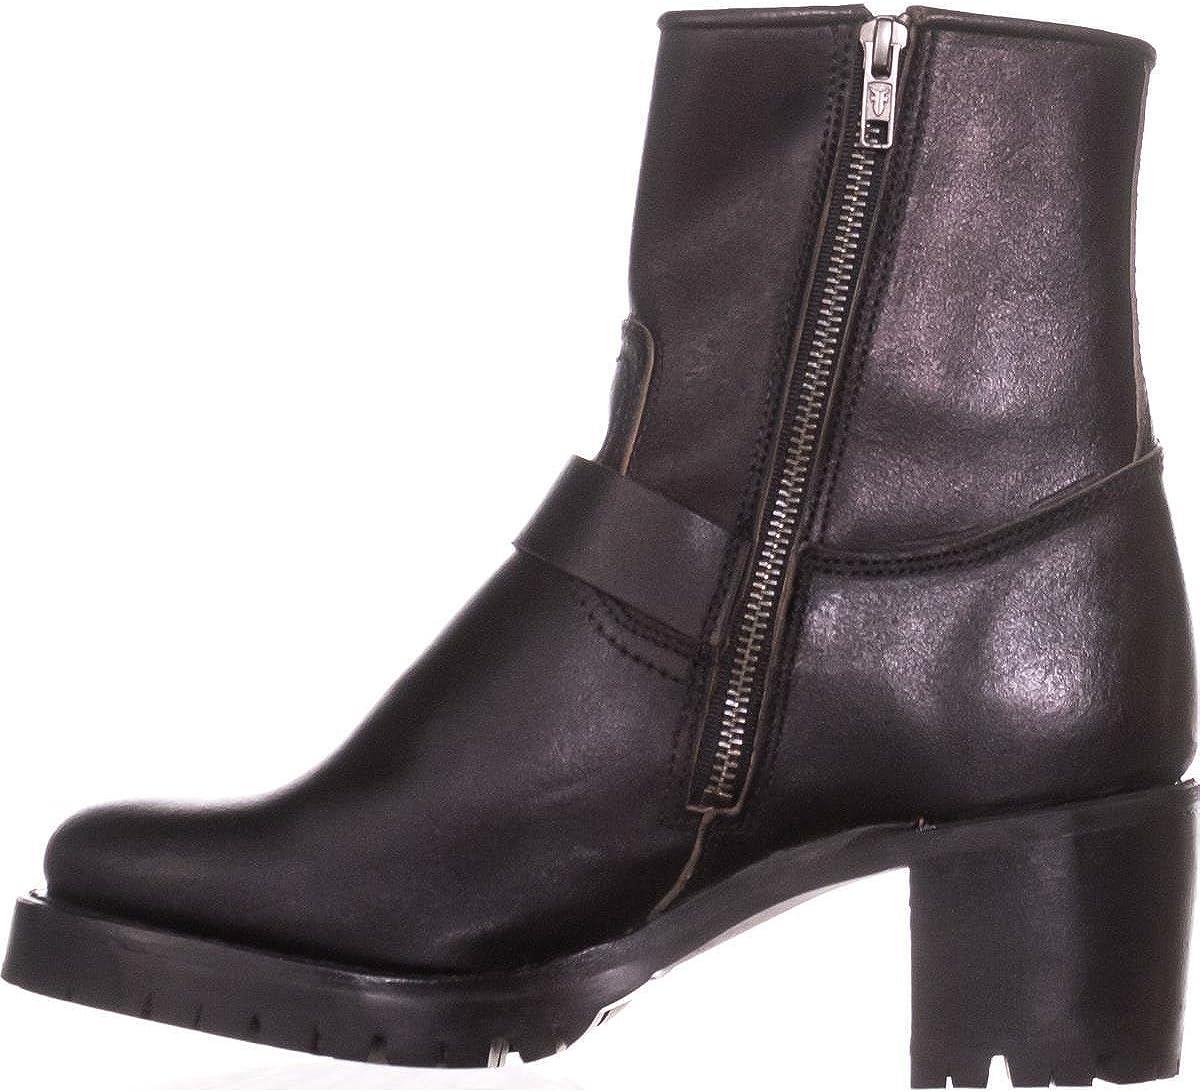 Frye Womens Sabrina Moto Engineer Boot